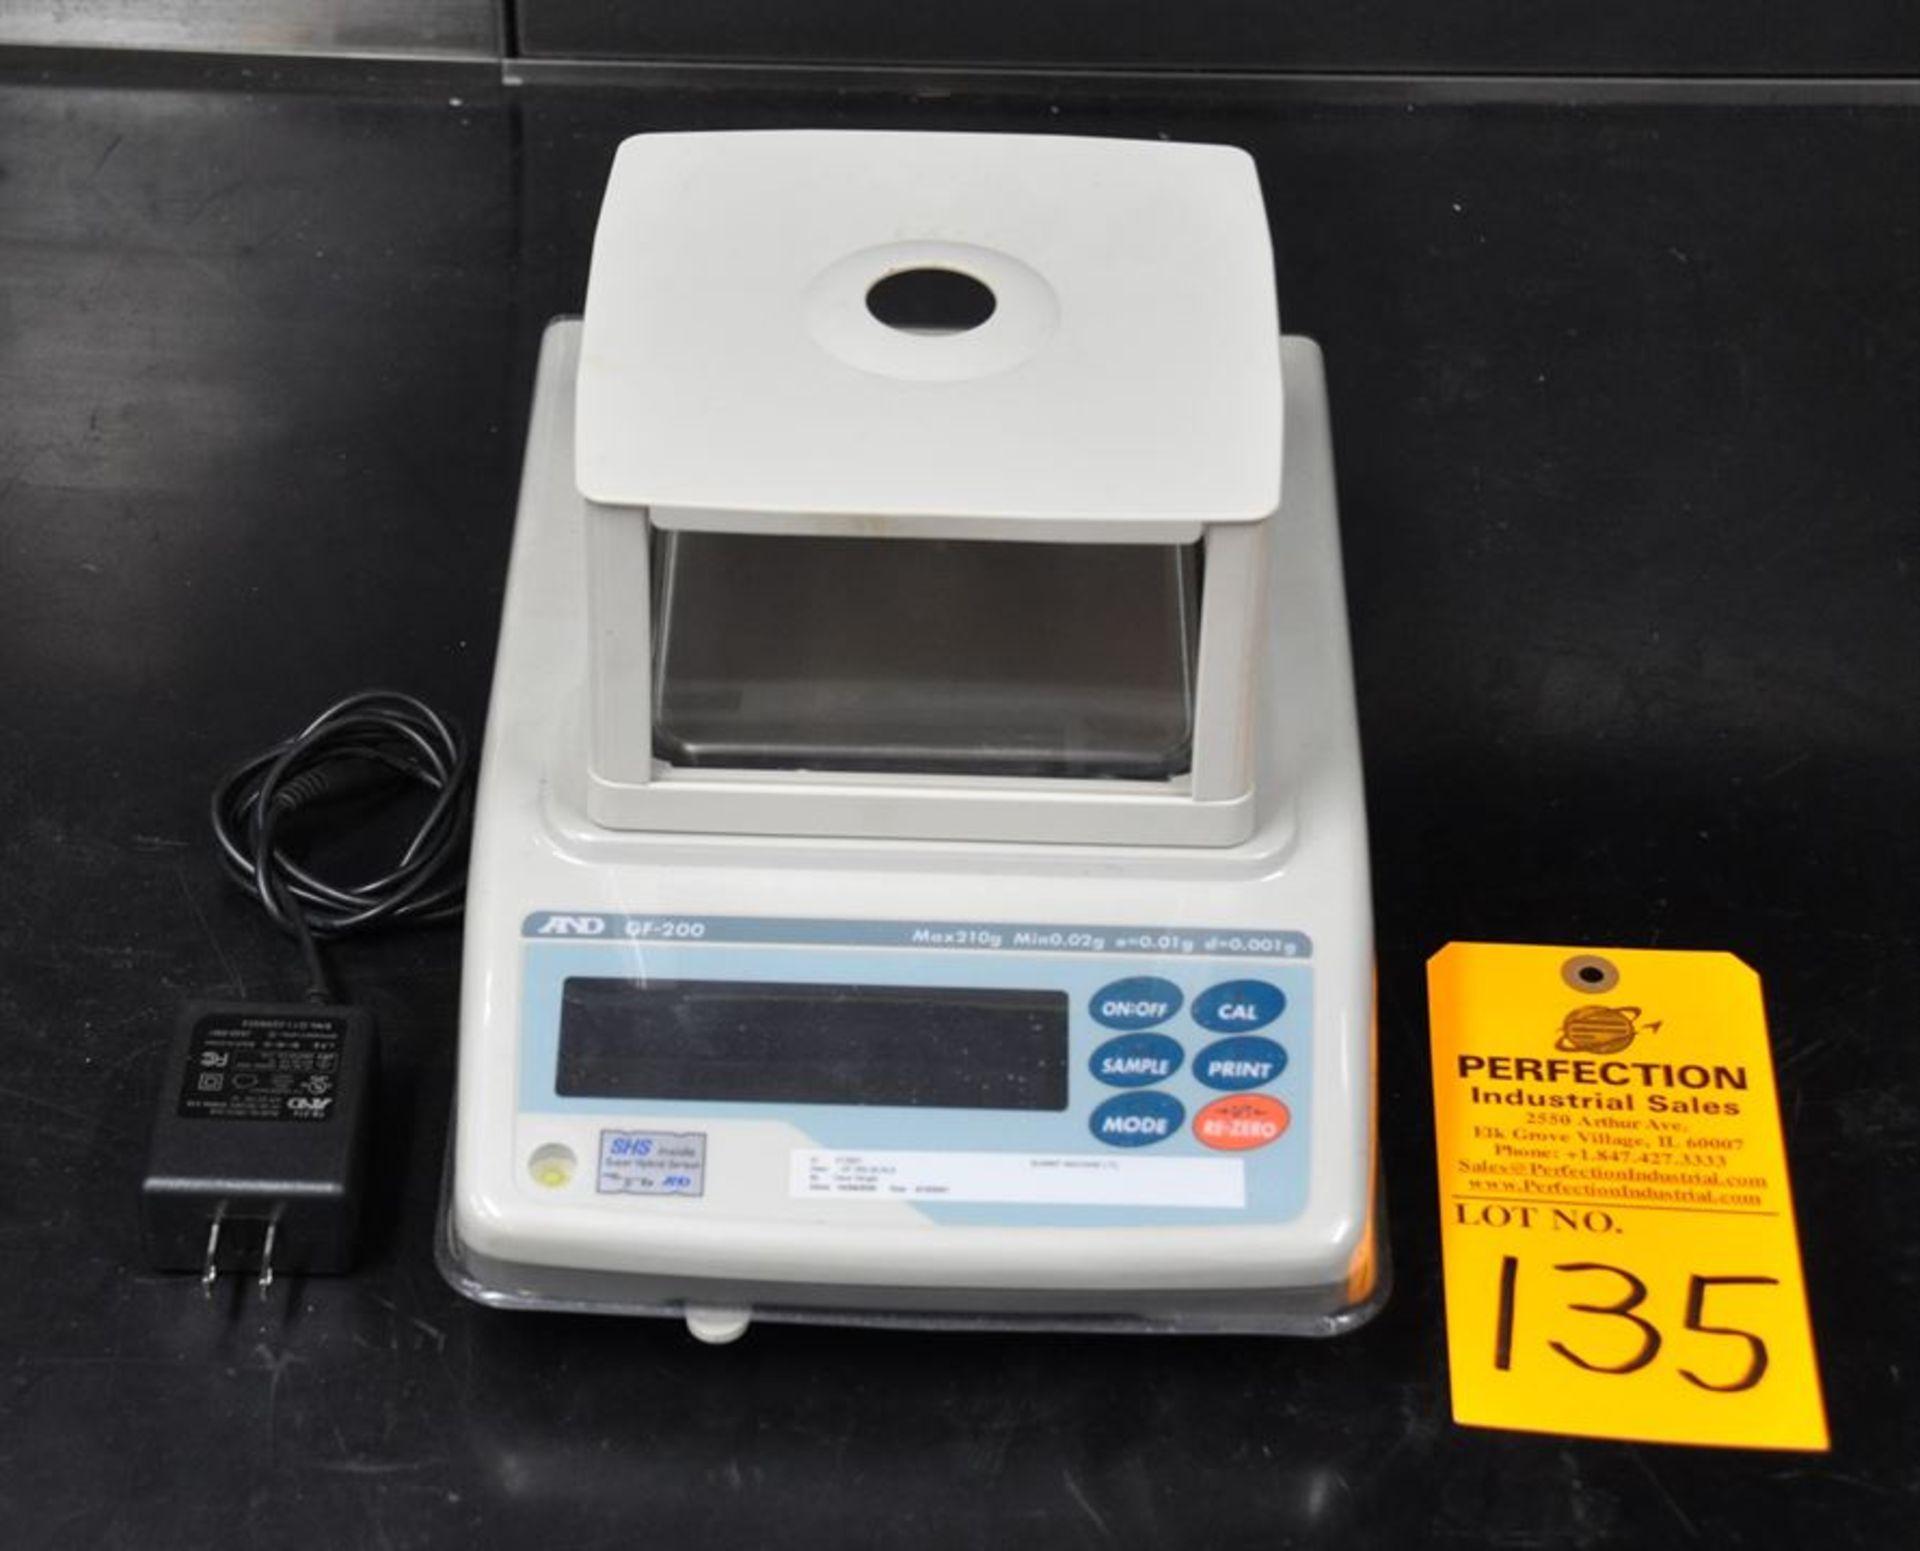 AND GF200 digital scale